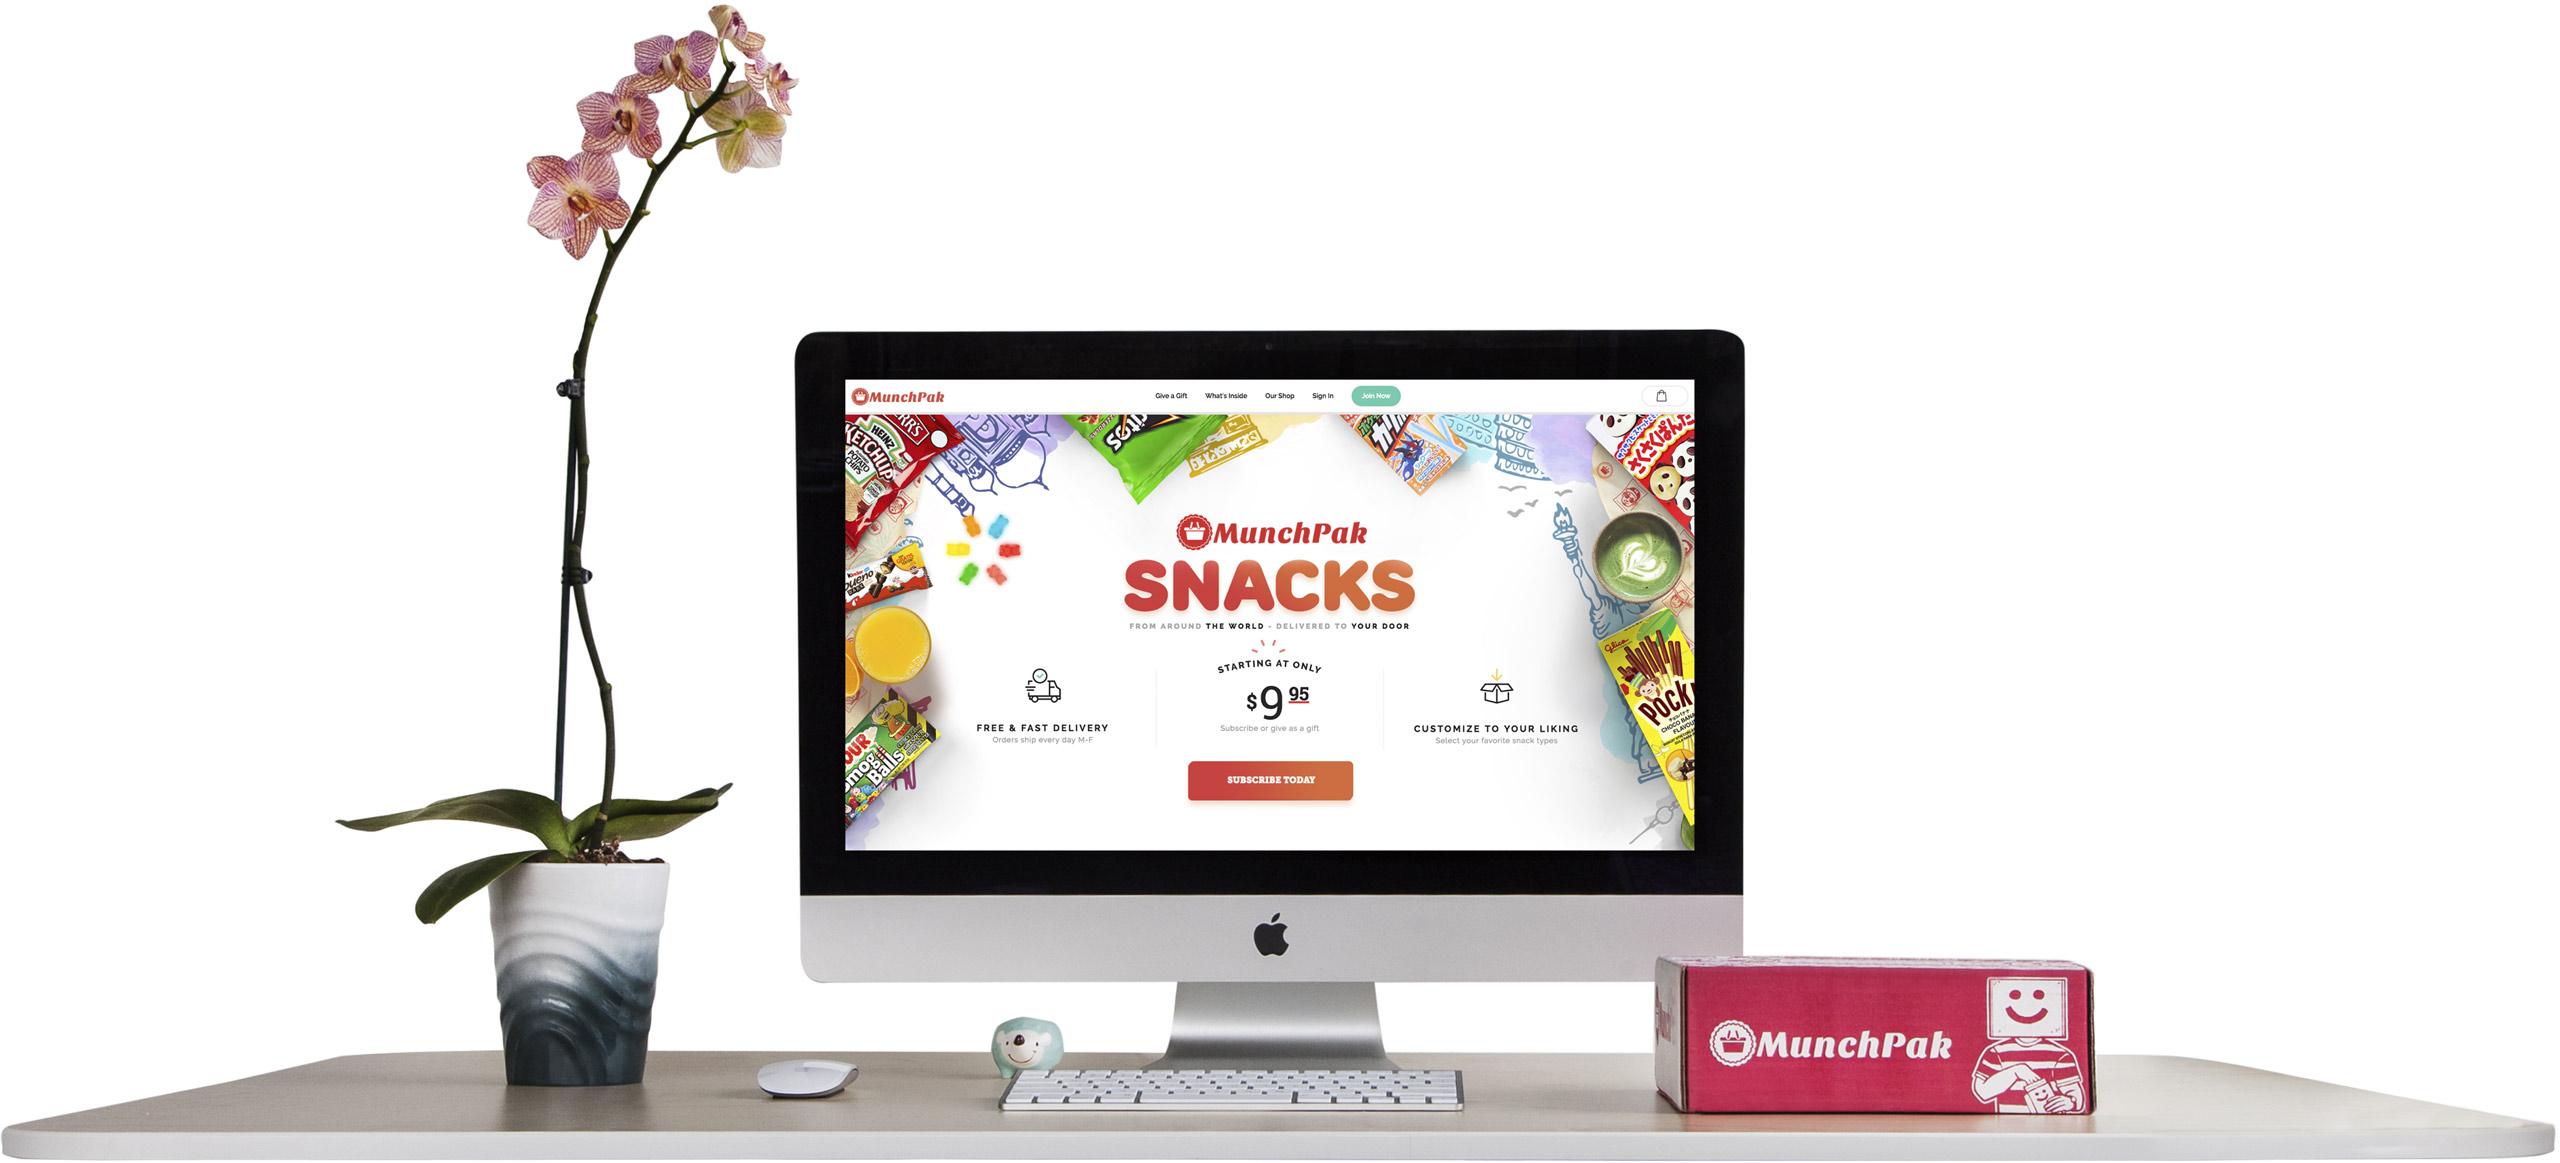 MunchPak snacks